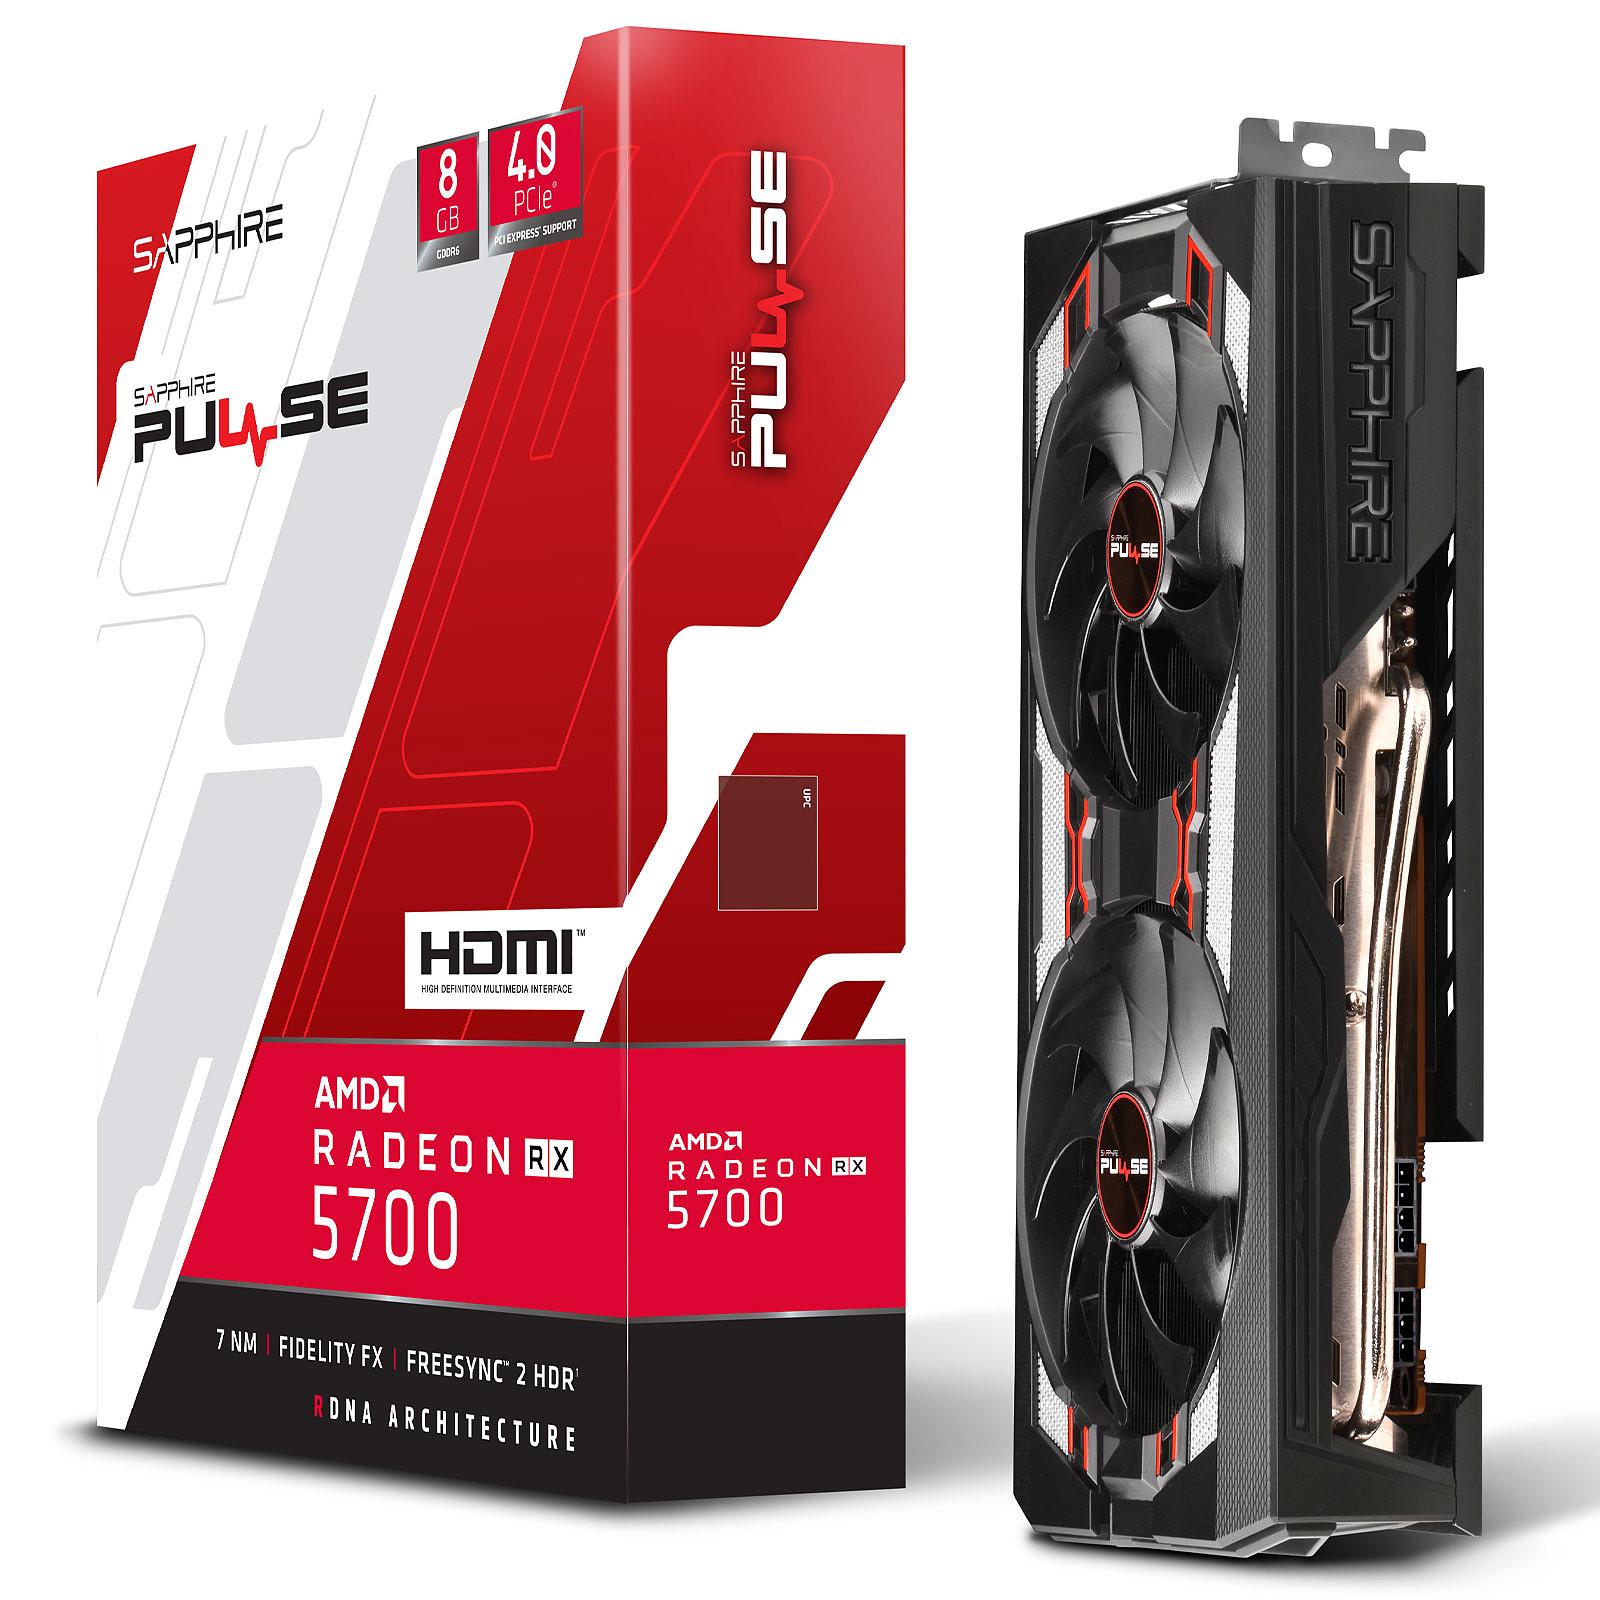 Sapphire PULSE Radeon RX 5700 8G